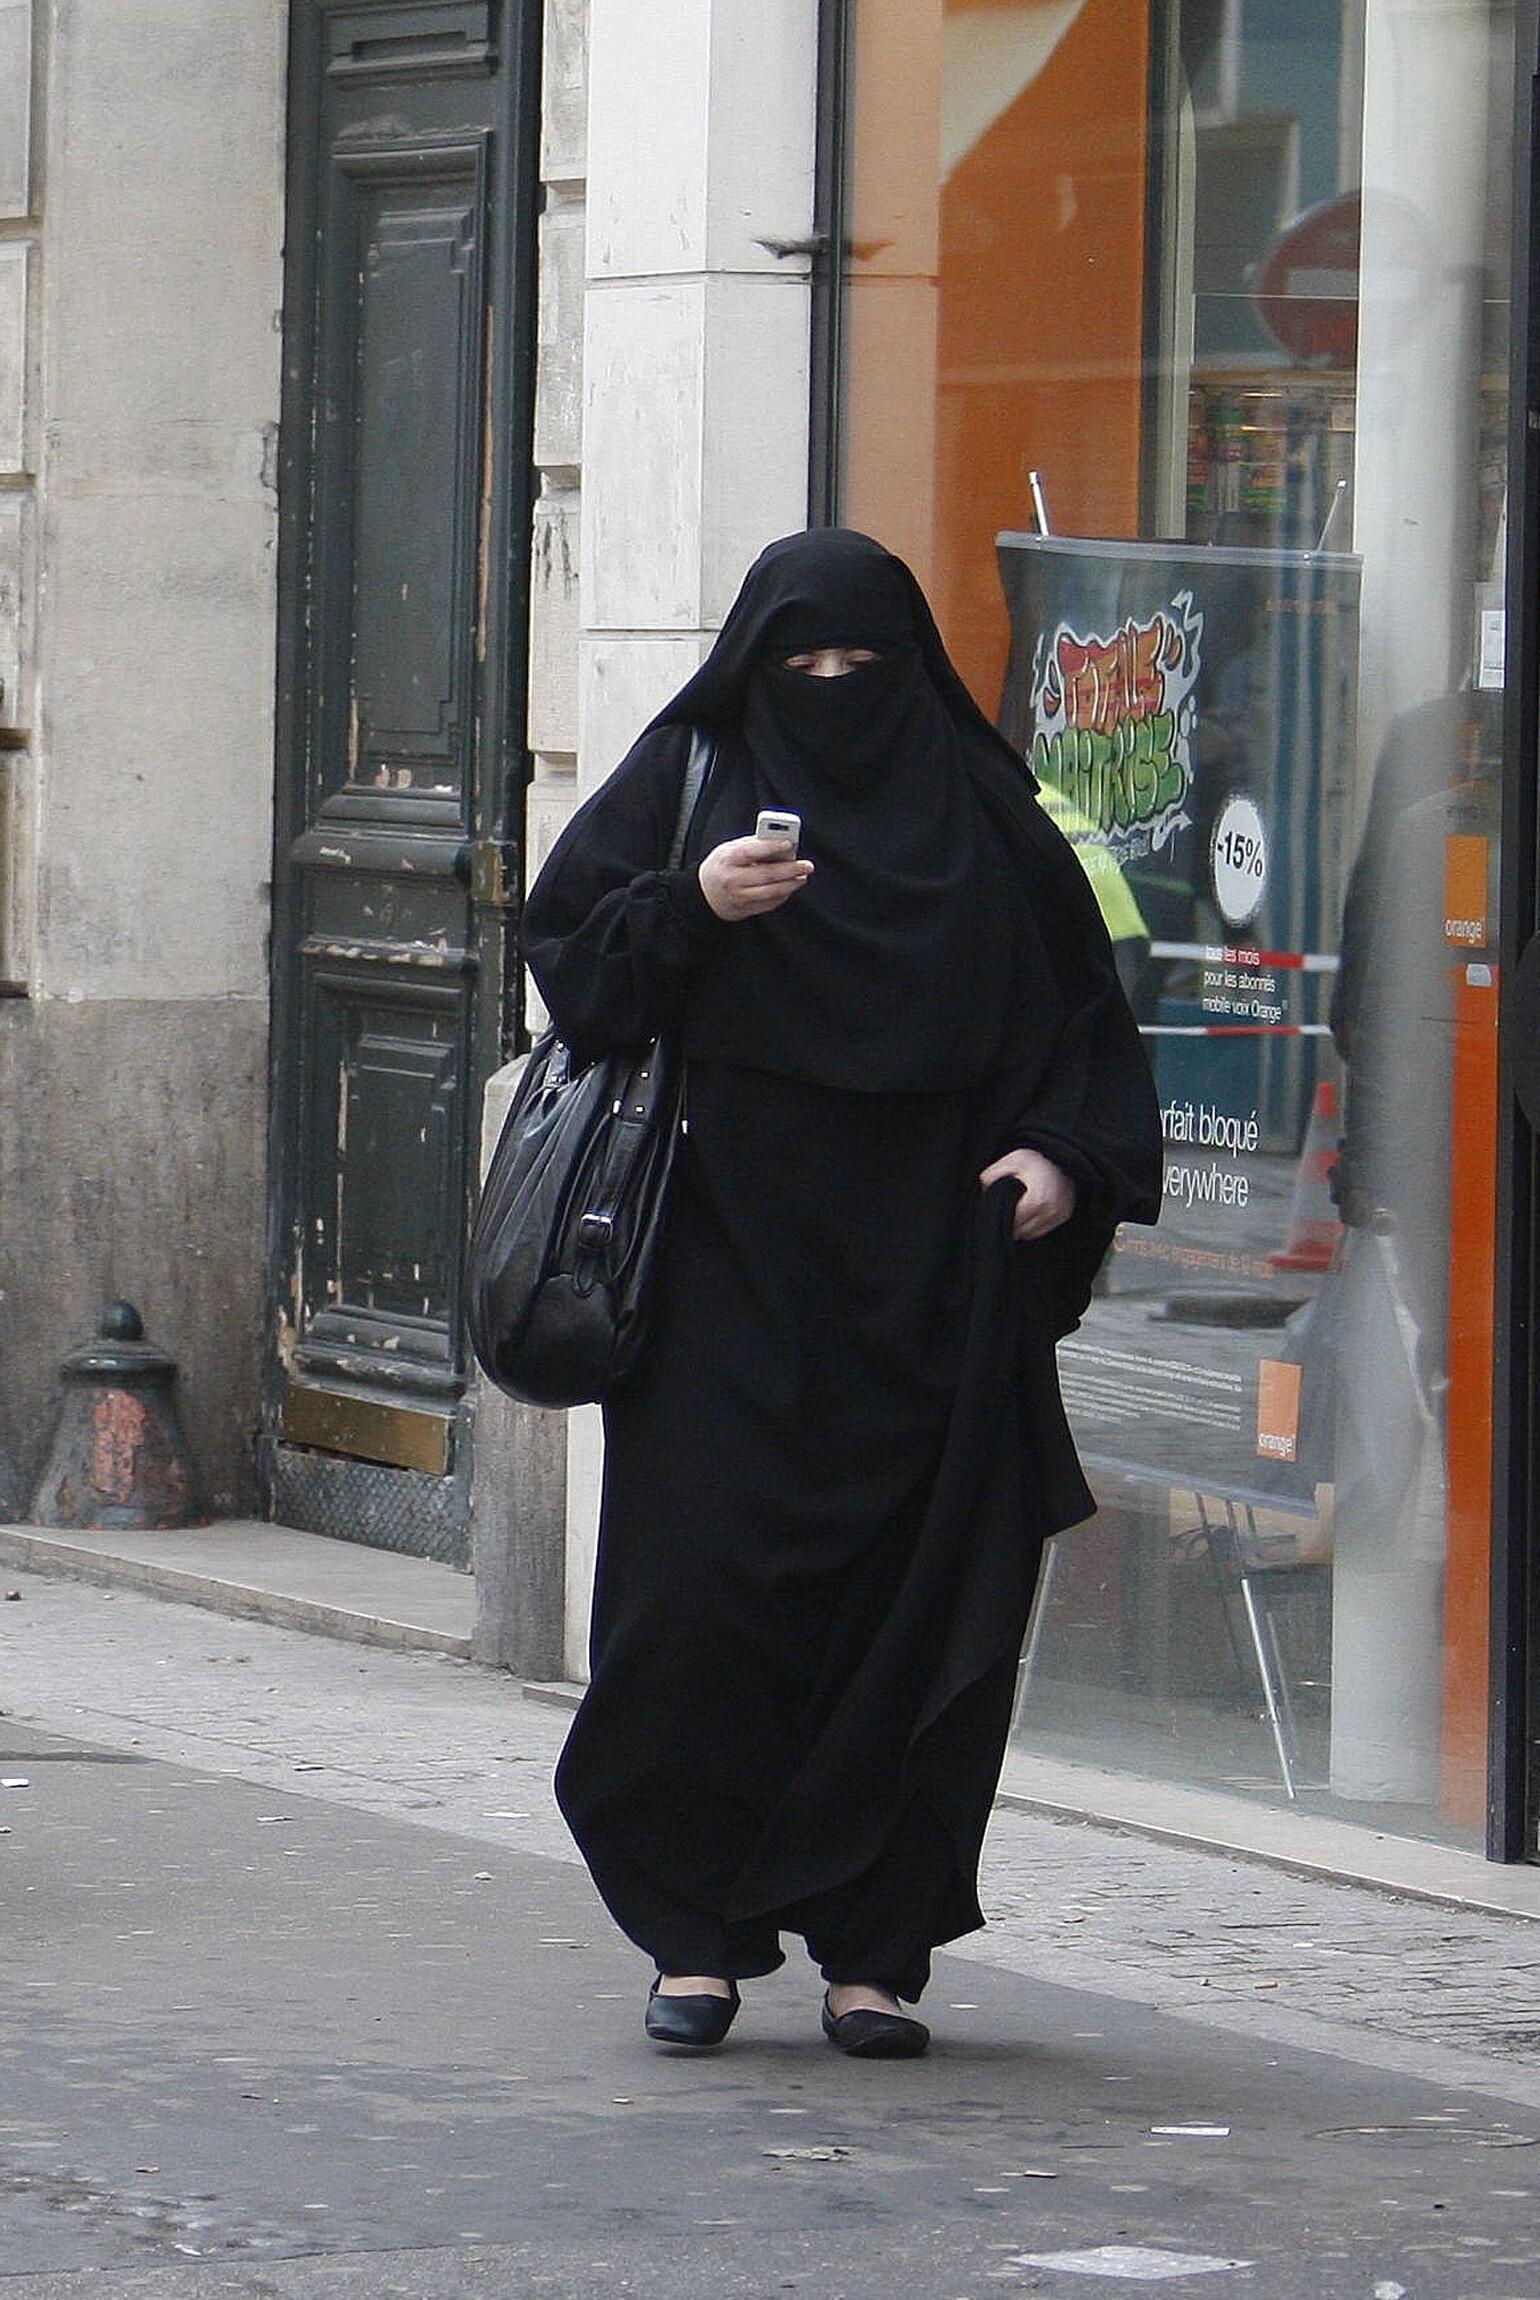 A woman wearing a burka in Saint-Denis, near Paris